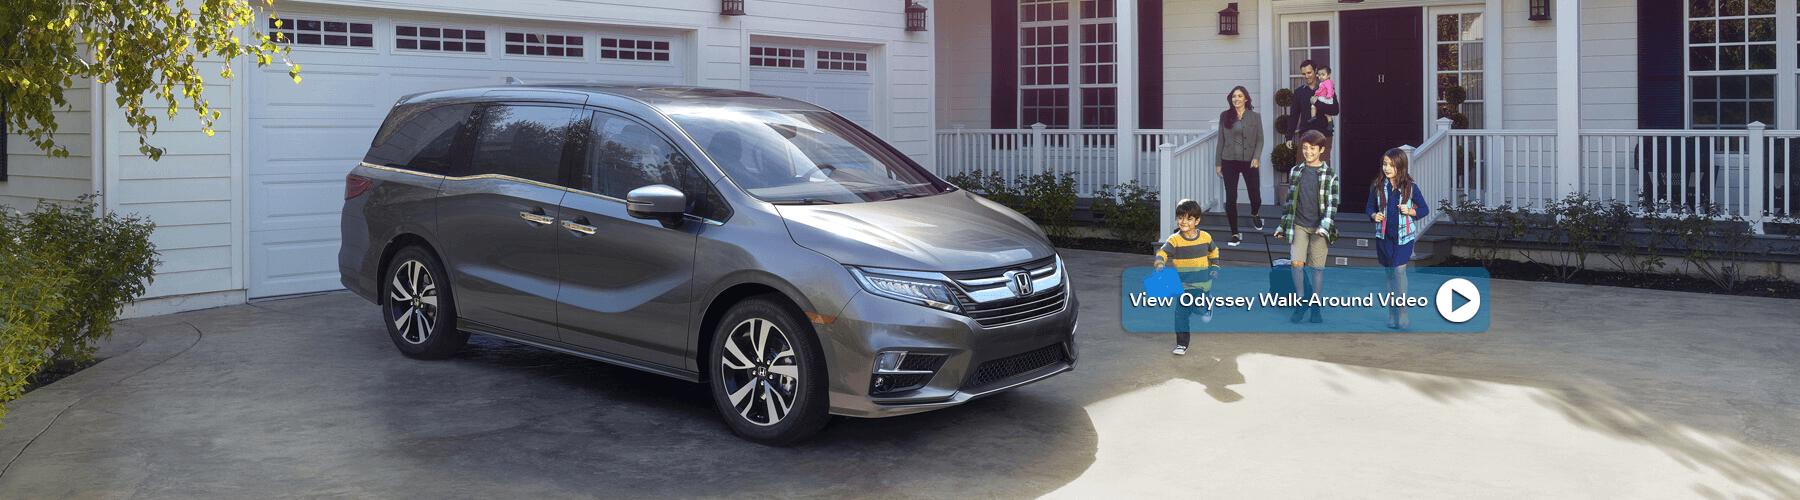 2018 Honda Odyssey Banner